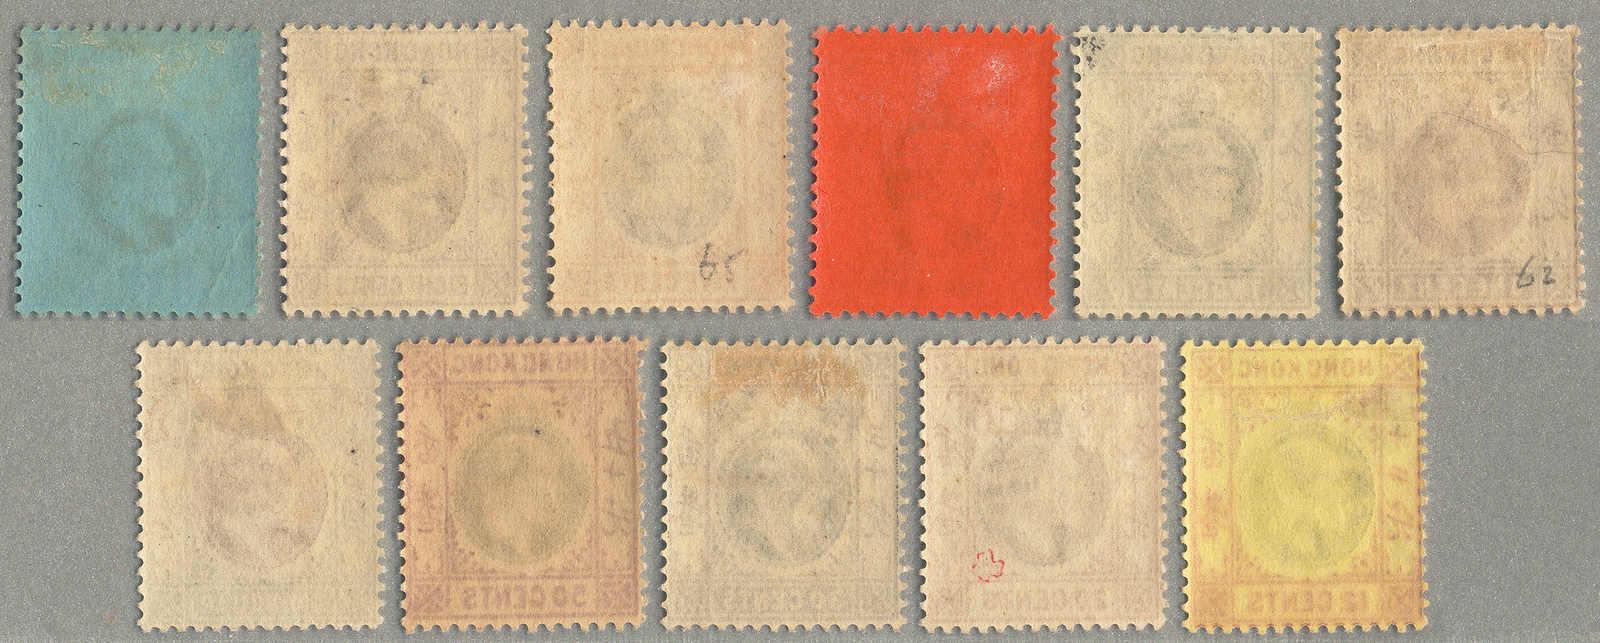 Lot 11288 - andere gebiete hongkong -  classicphil GmbH 7'th classicphil Auction - Day 1